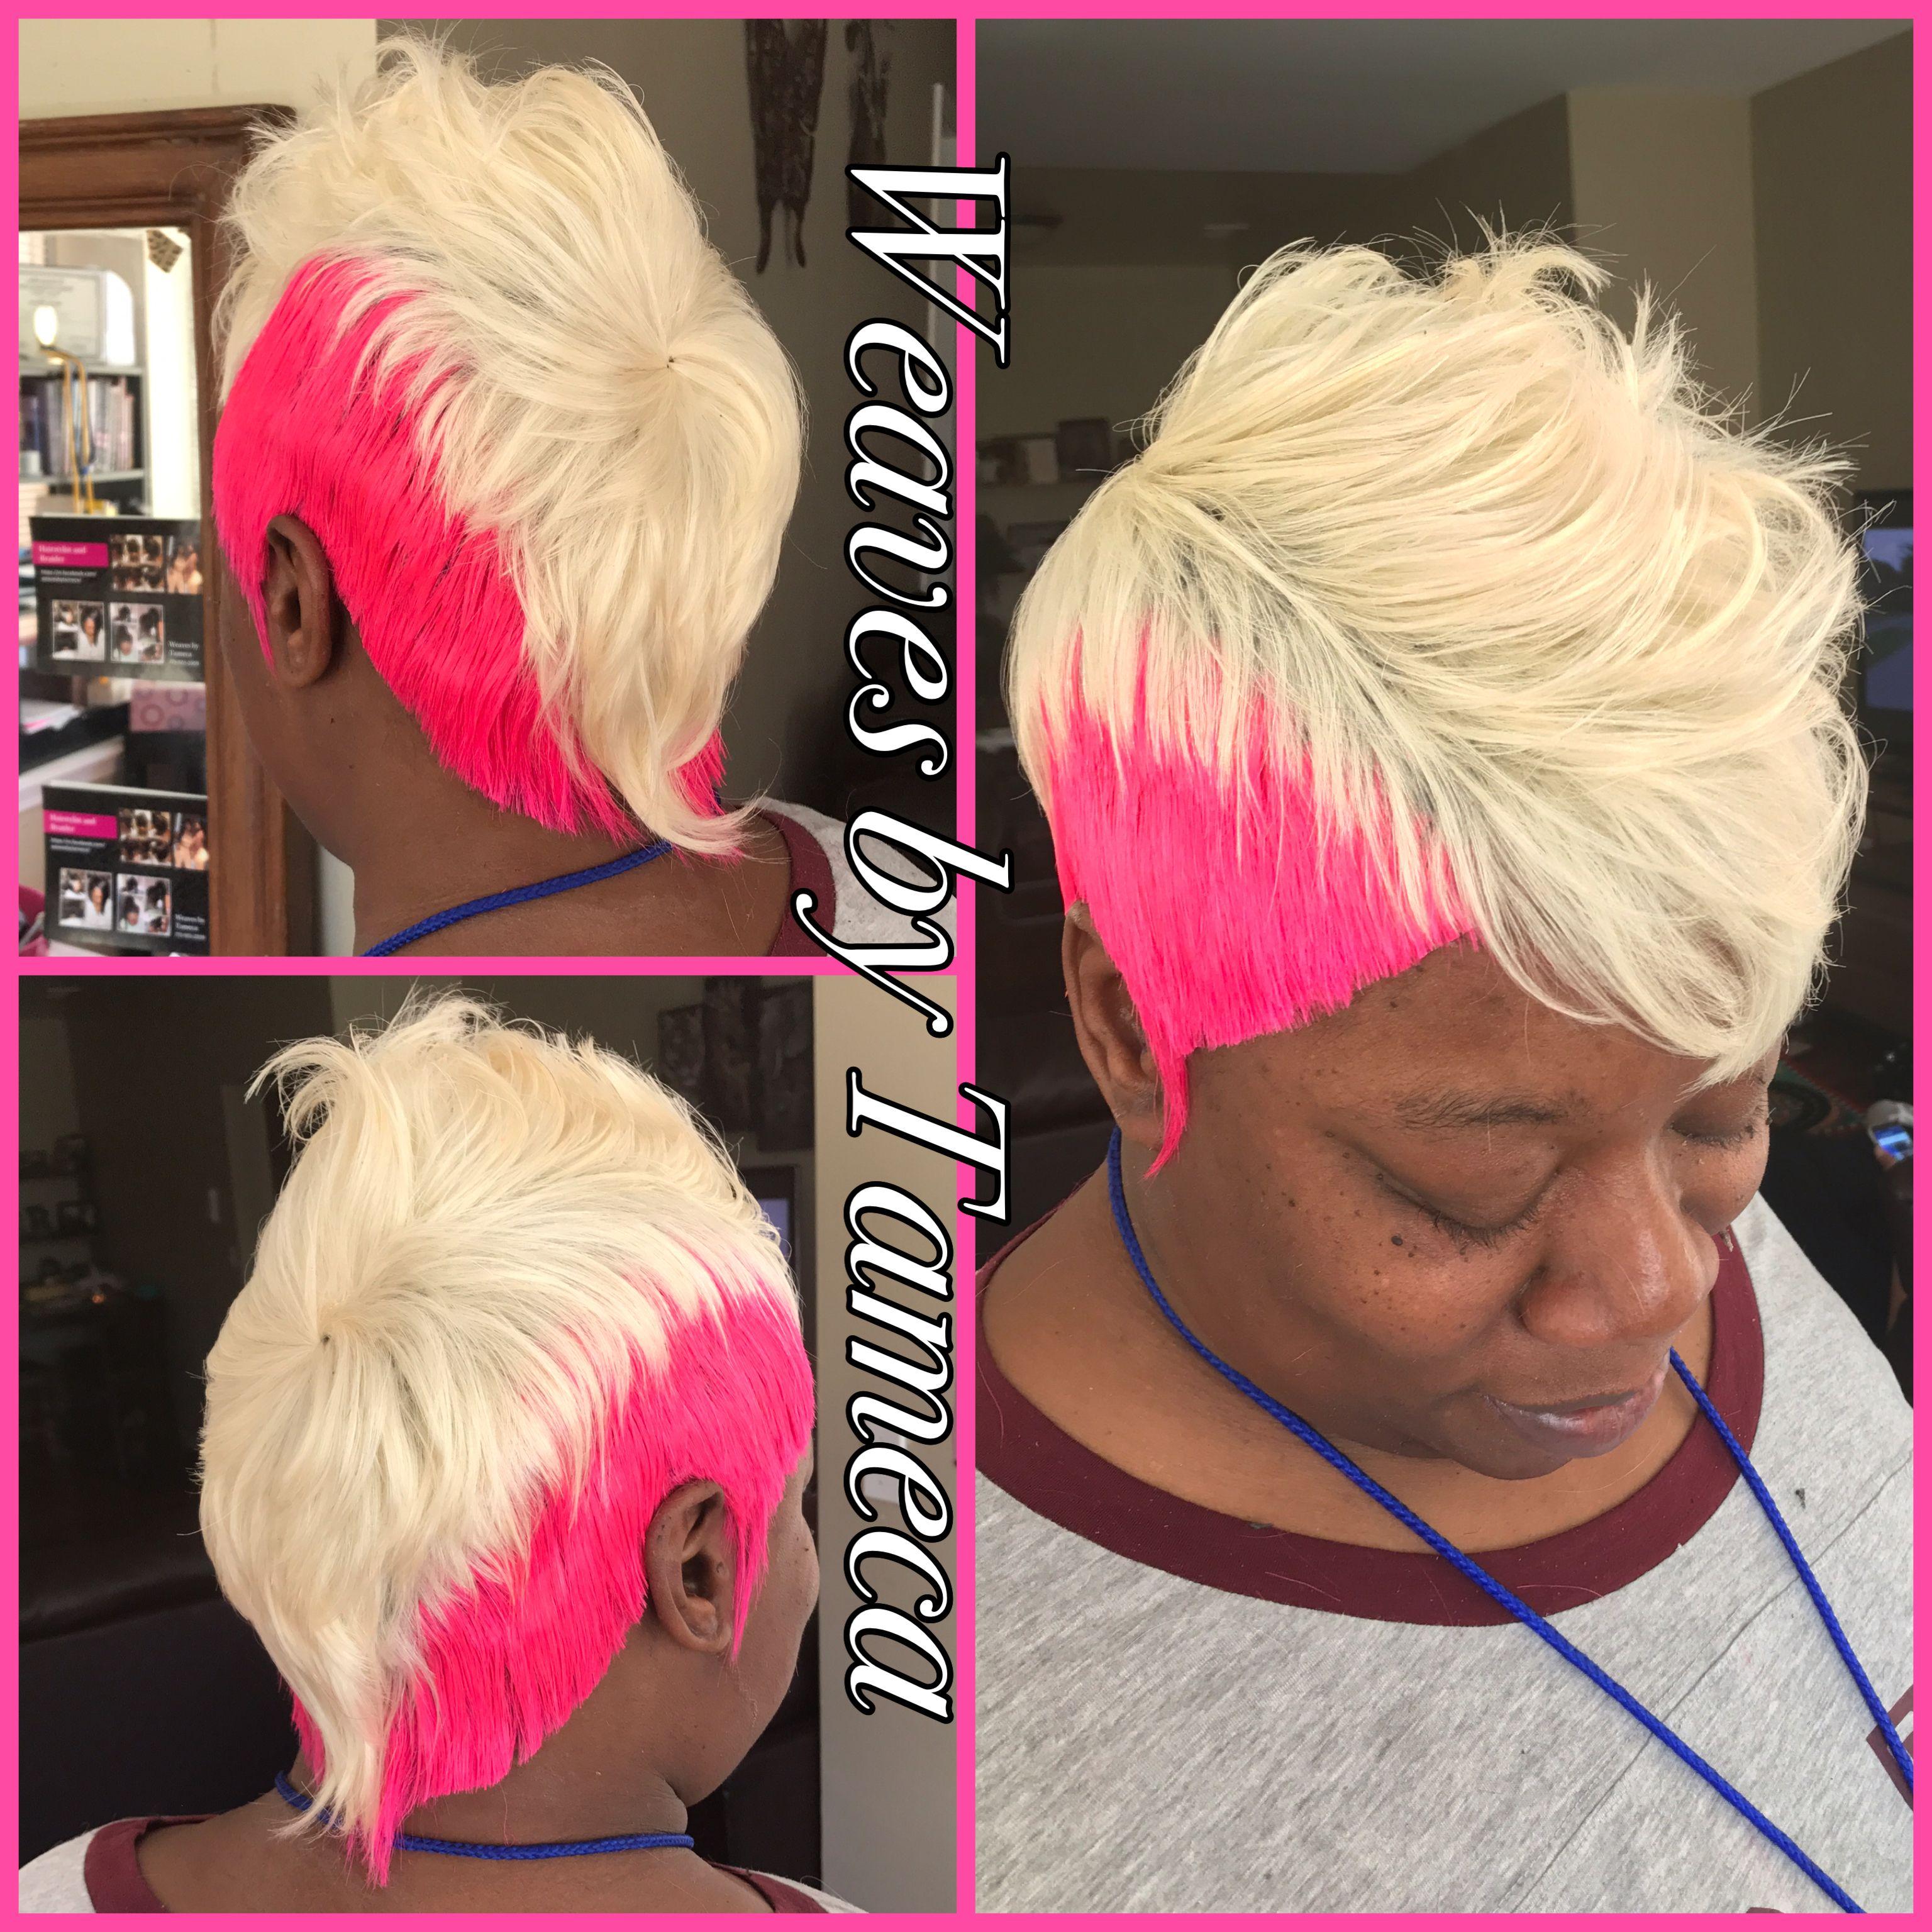 Pink Hair Short Hair White Blonde Mohawk 27 Piece Neon Pink Wig Hairstyles Womens Hairstyles Short Hair Styles